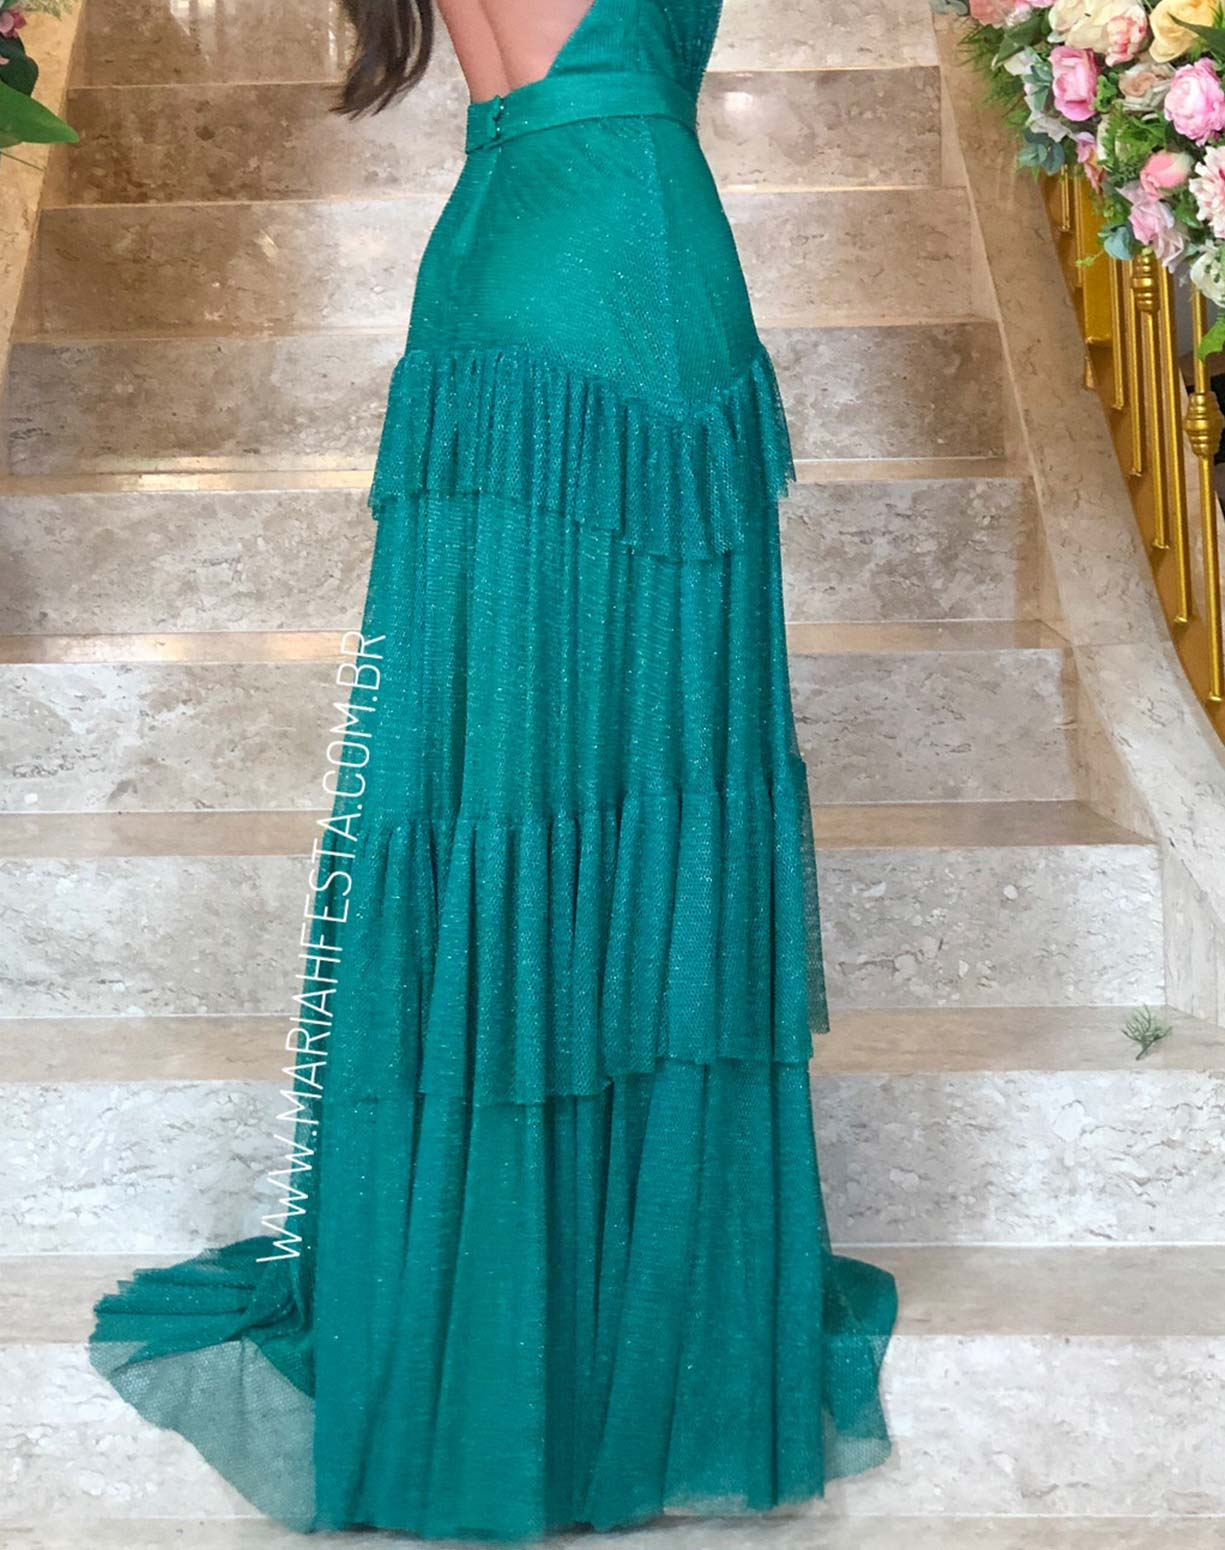 Vestido Verde em Tule Tela com Glitter